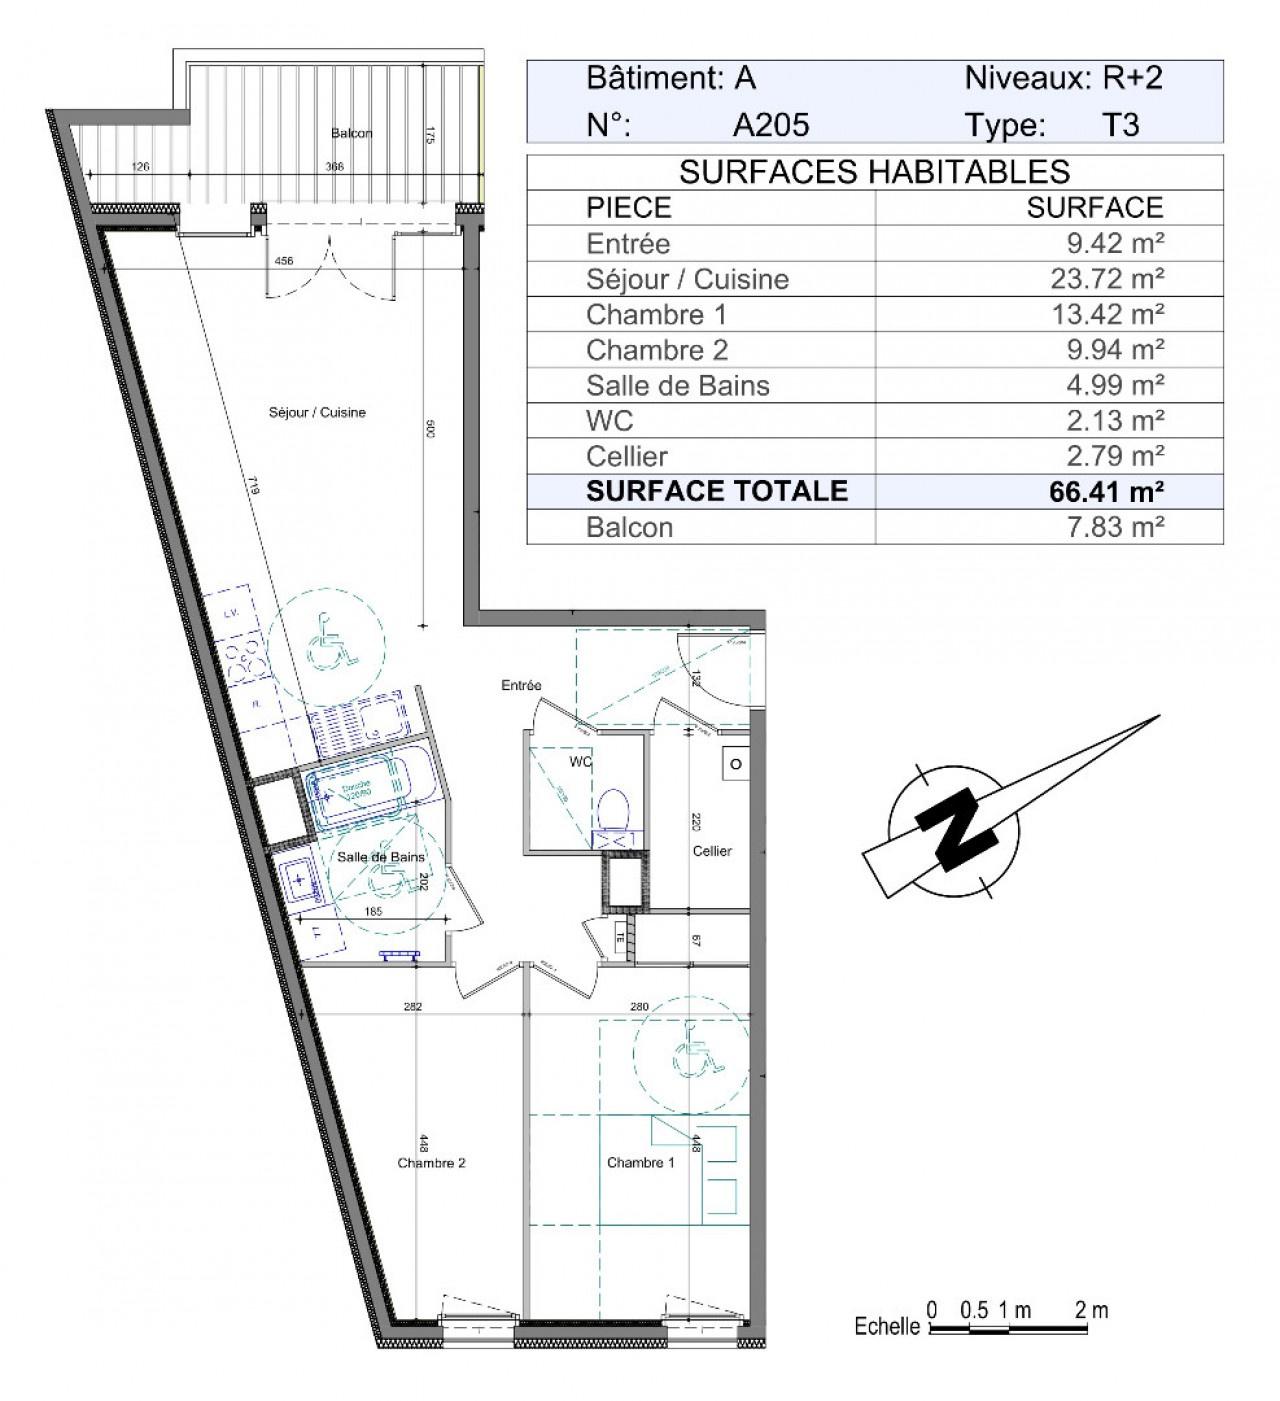 Surface Standard Salle De Bain homeline 74 france - agence immobilière, page 3 | fr